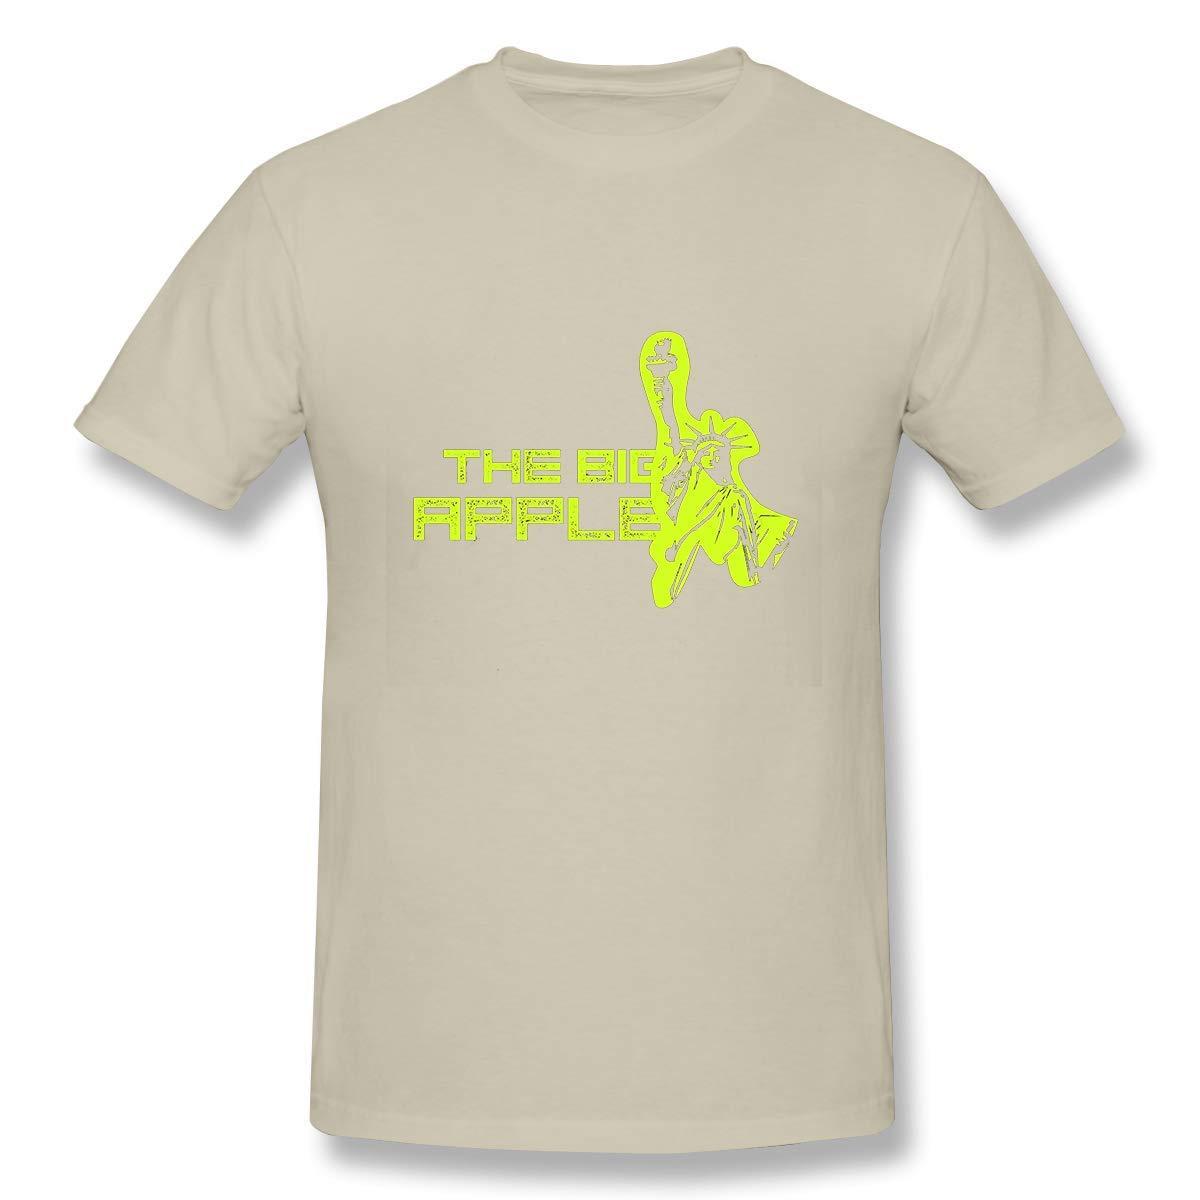 Mens Short-Sleeve Crew Neck Cotton Stretch T-Shirt Big Apple wear Design p Sand Color4X-Large